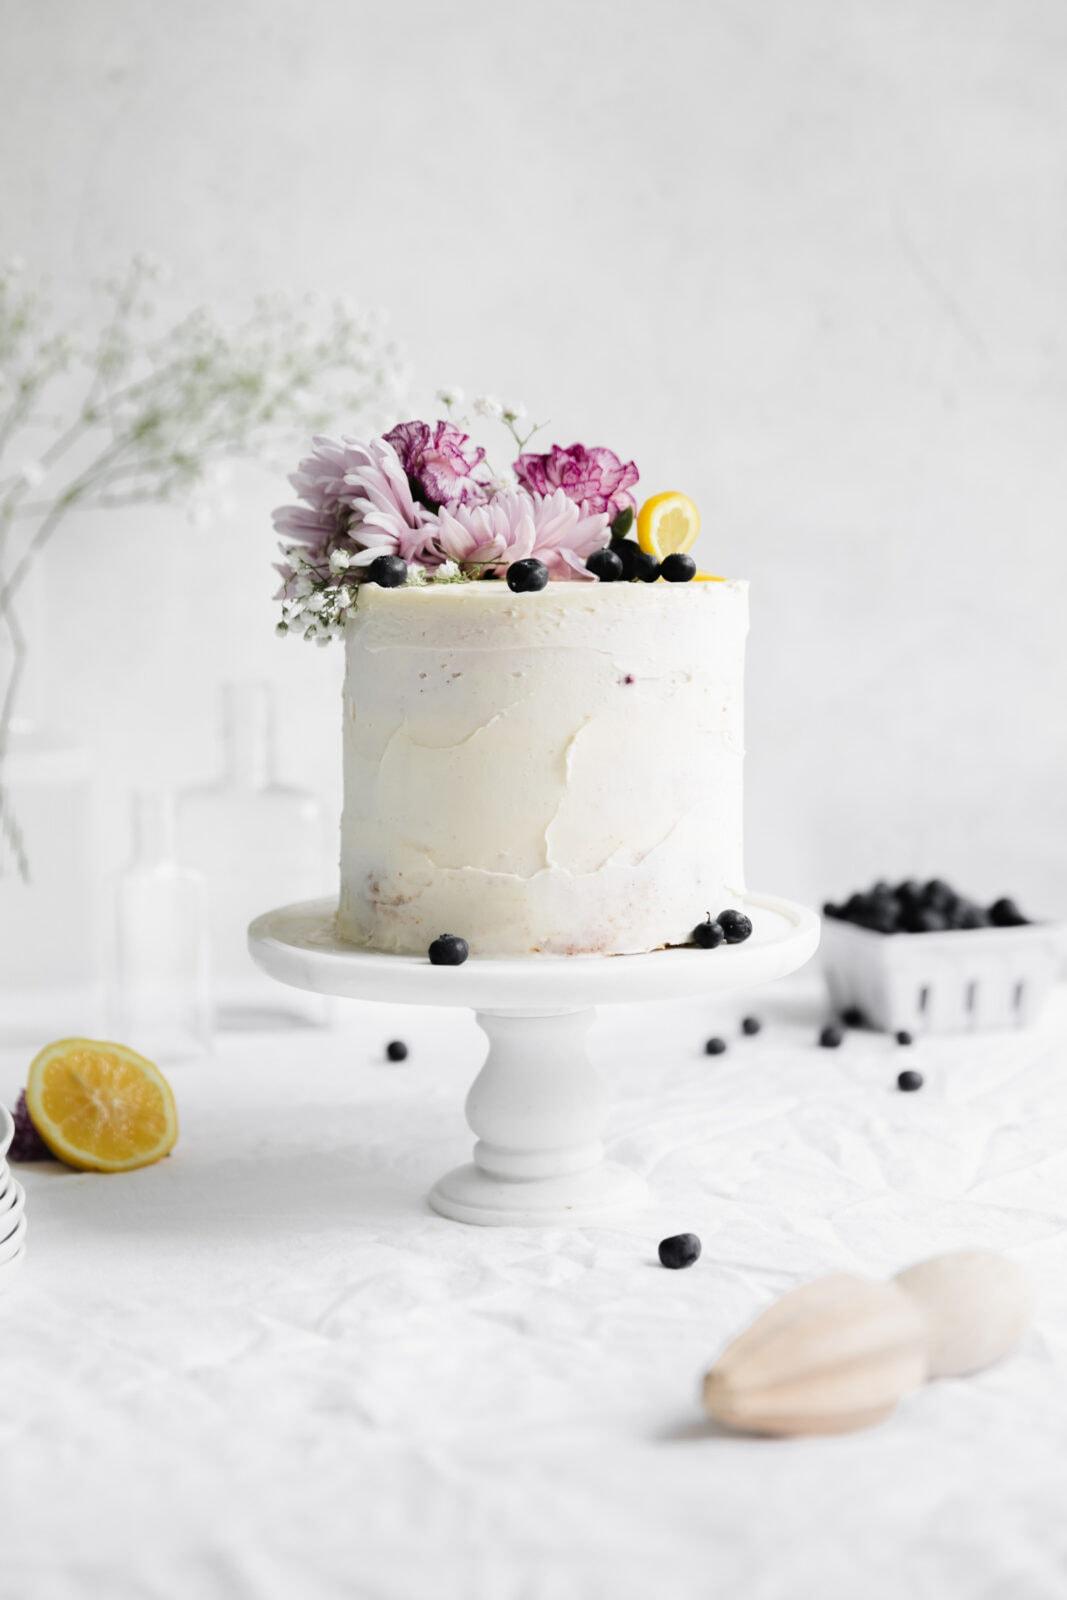 lemon cake on a cakestand